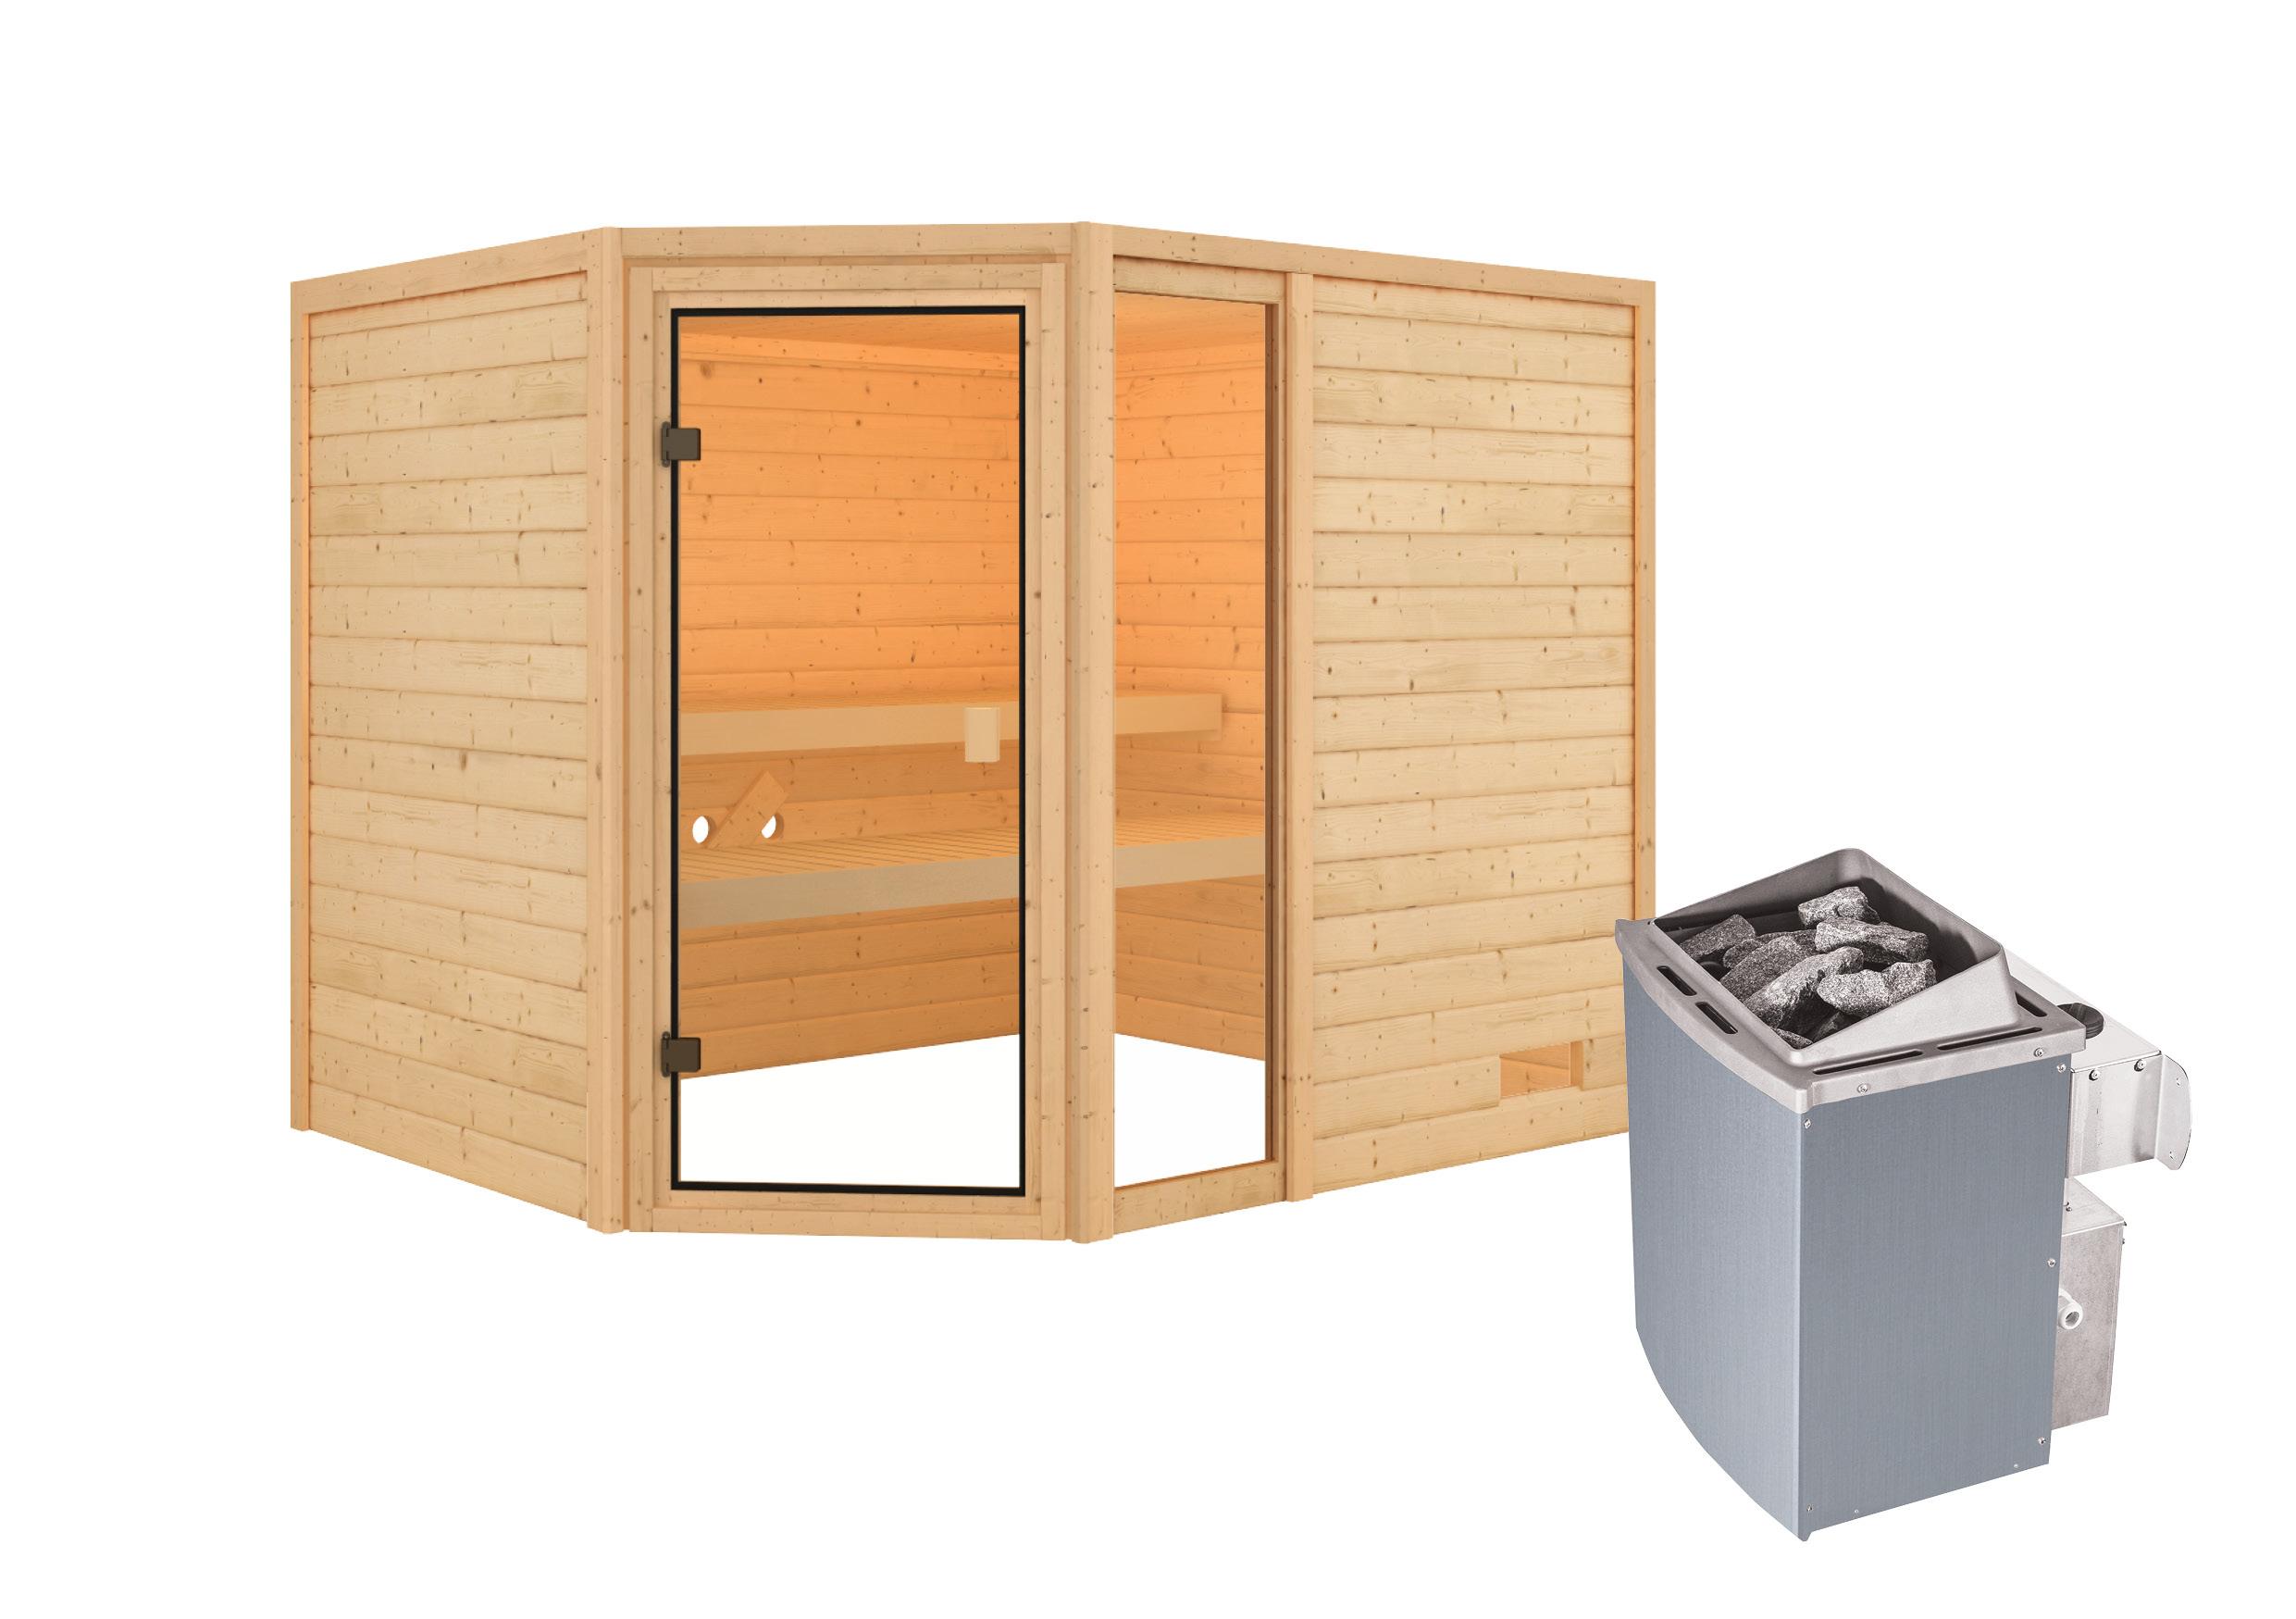 Woodfeeling Sauna Lola 38mm Saunaofen 9 kW intern Bild 2